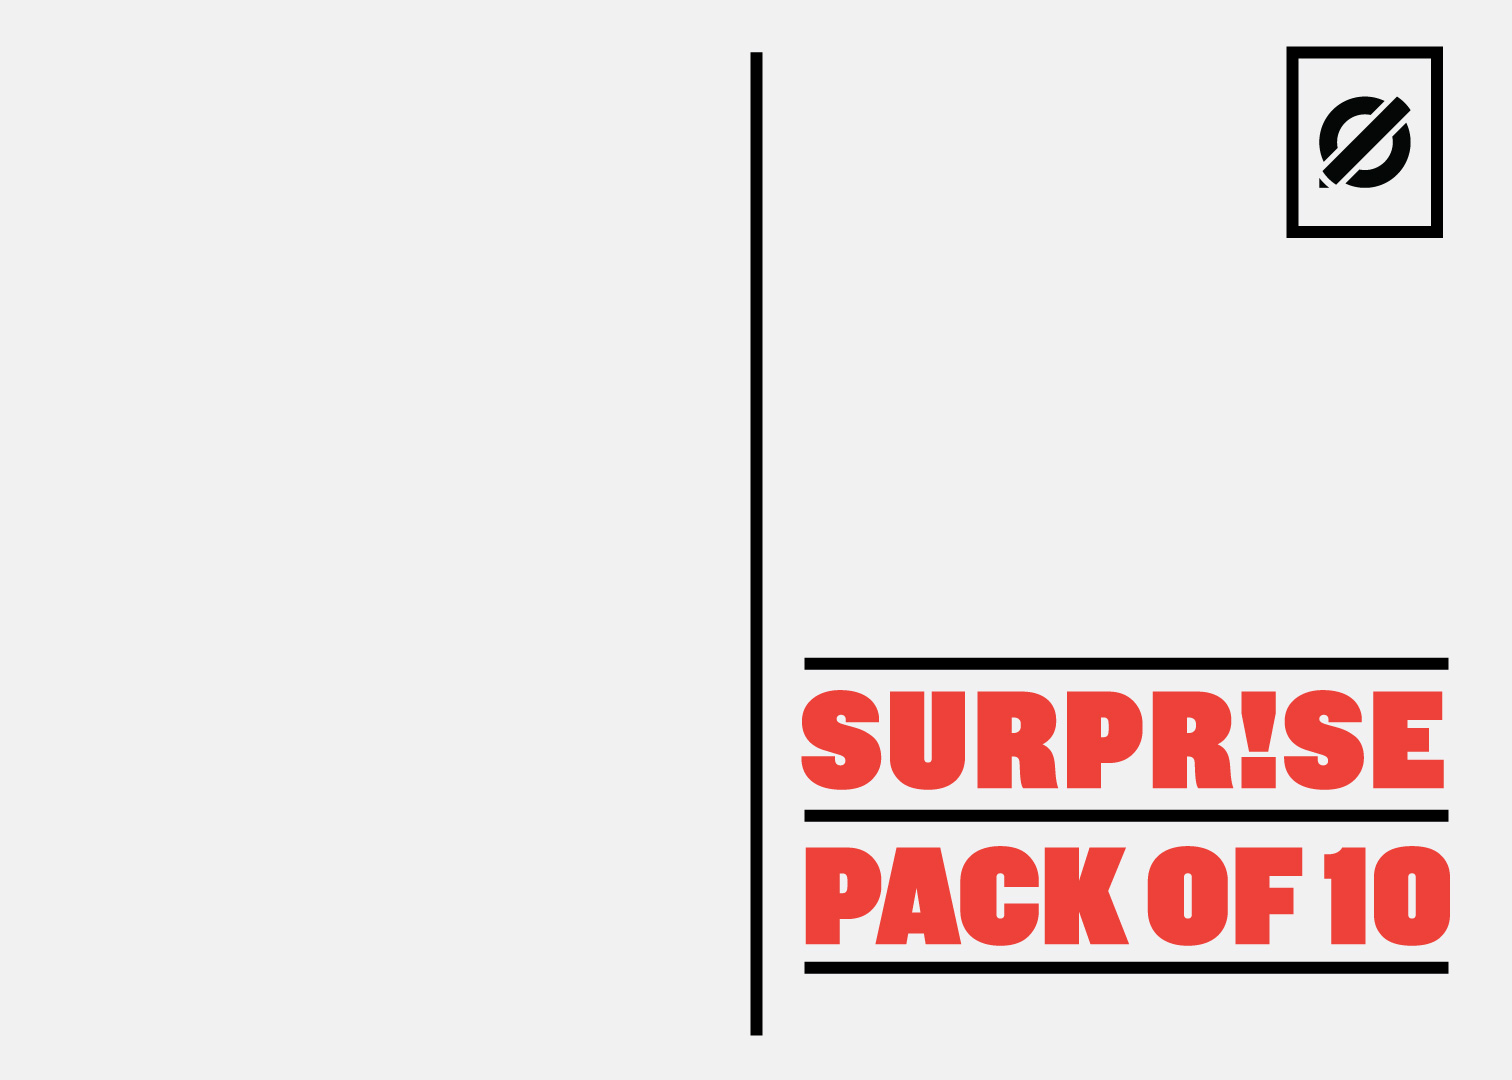 Surprise-back_red.jpg